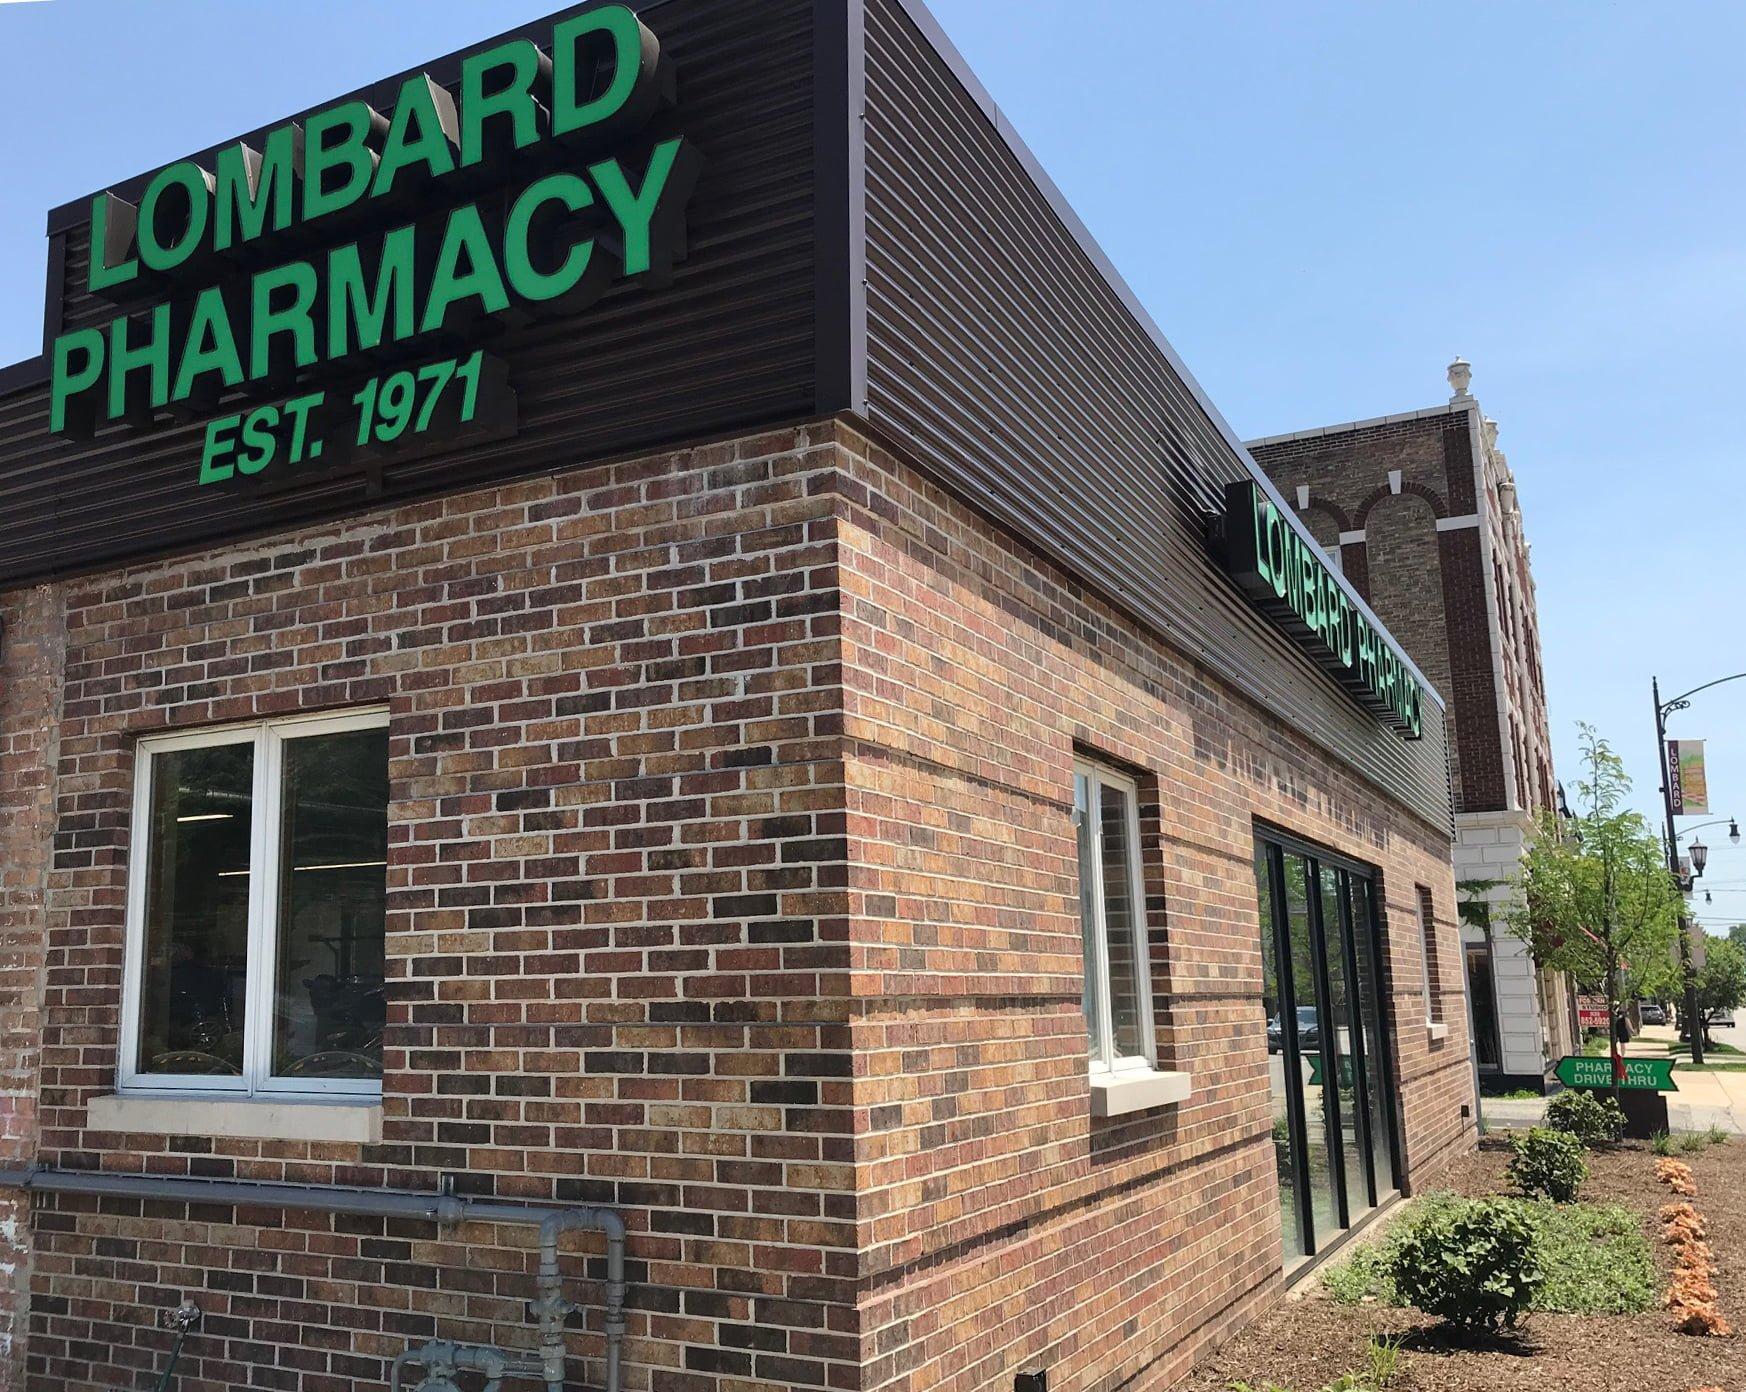 Lombard-Pharmacy-Cropt1